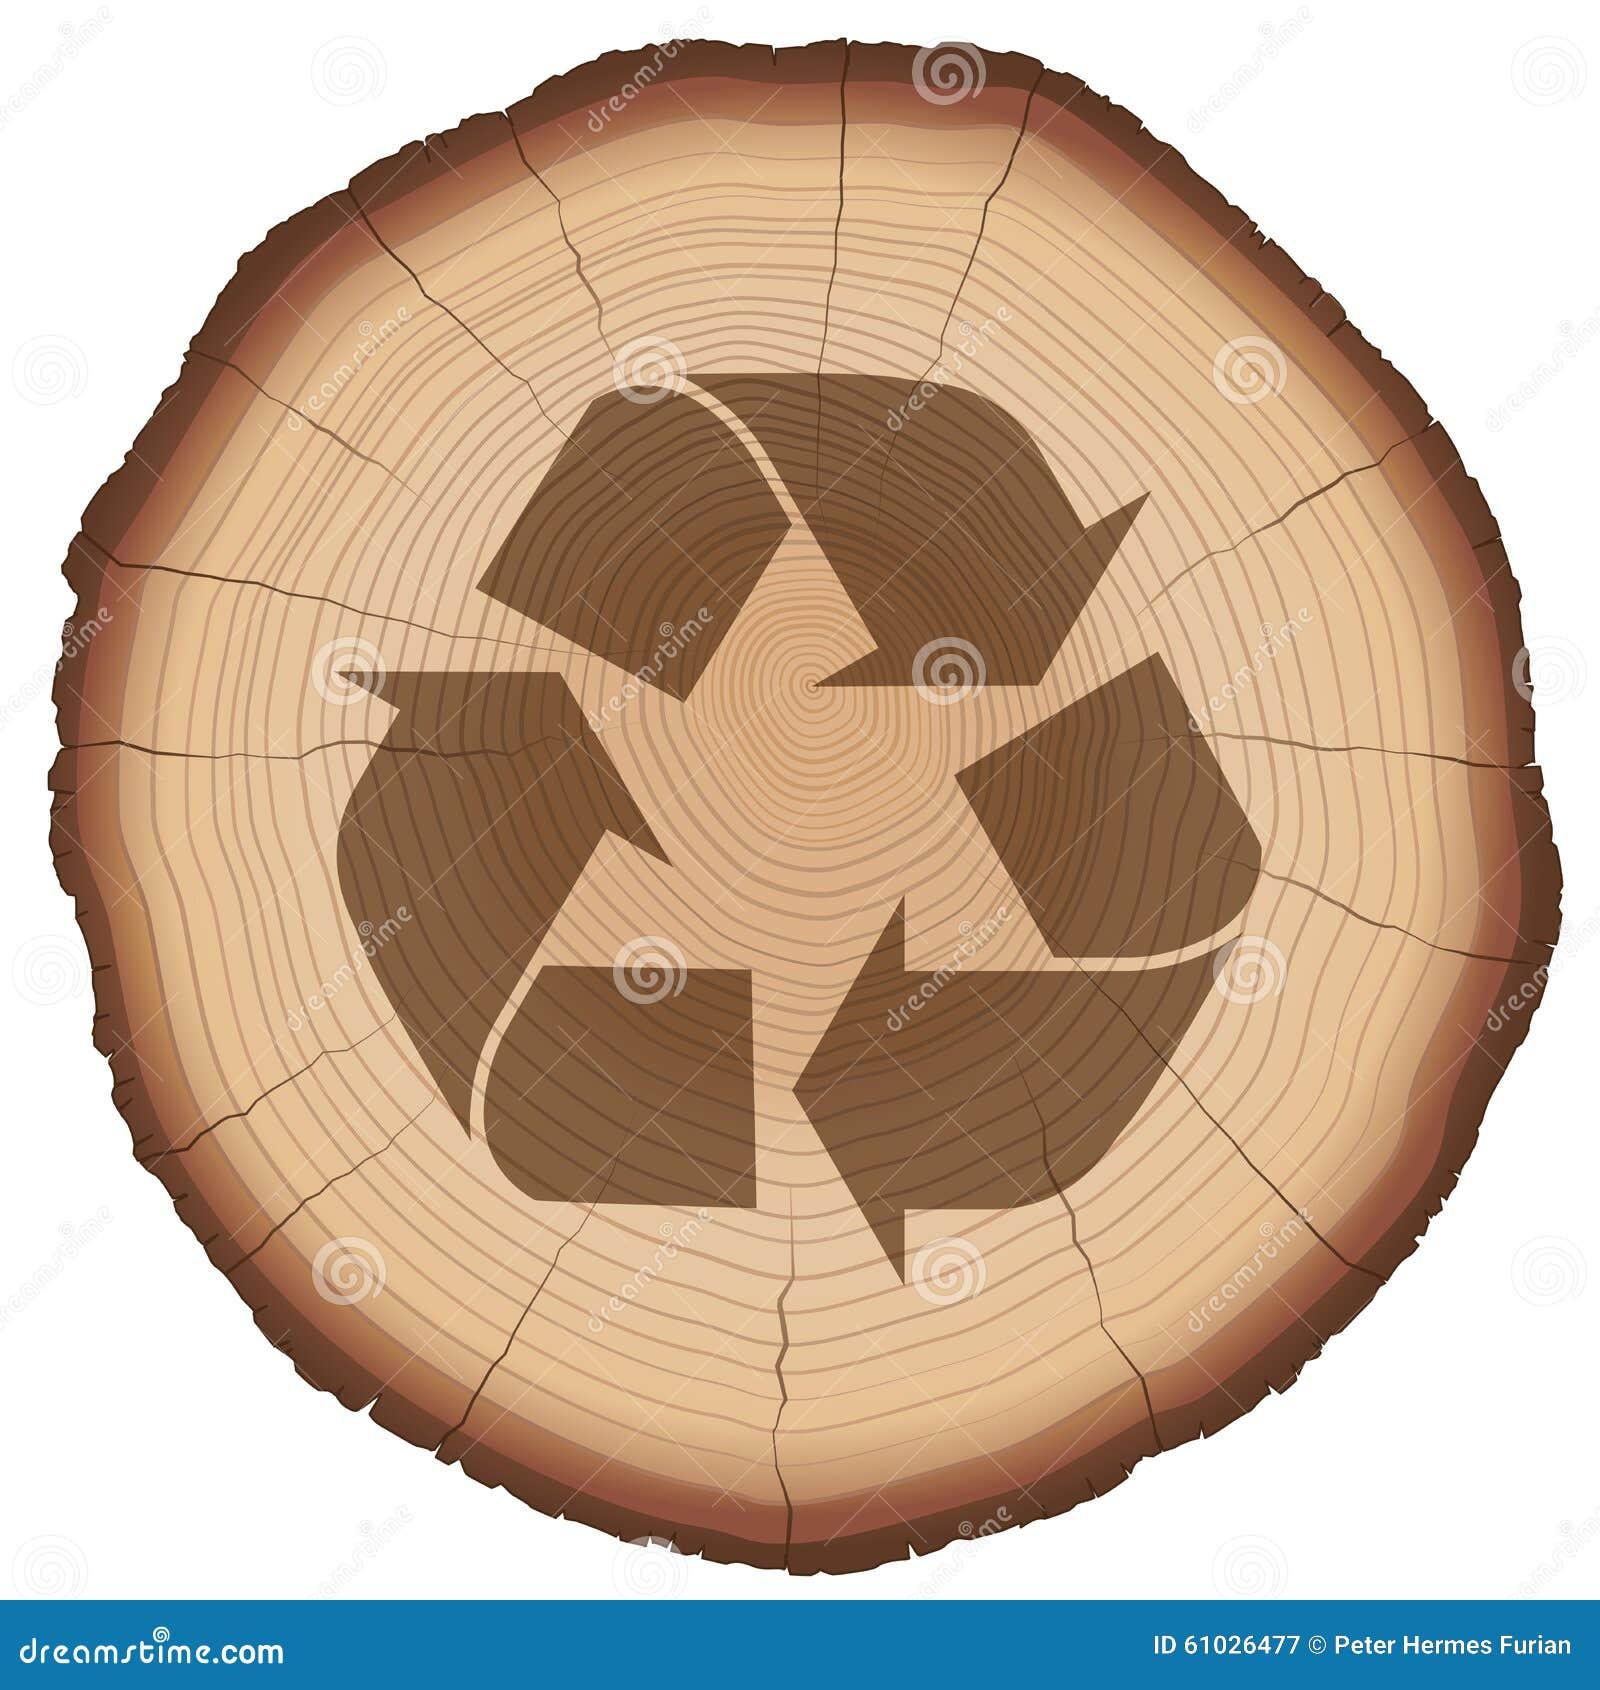 Tronco de rbol de reciclaje de madera del s mbolo - Reciclaje de la madera ...